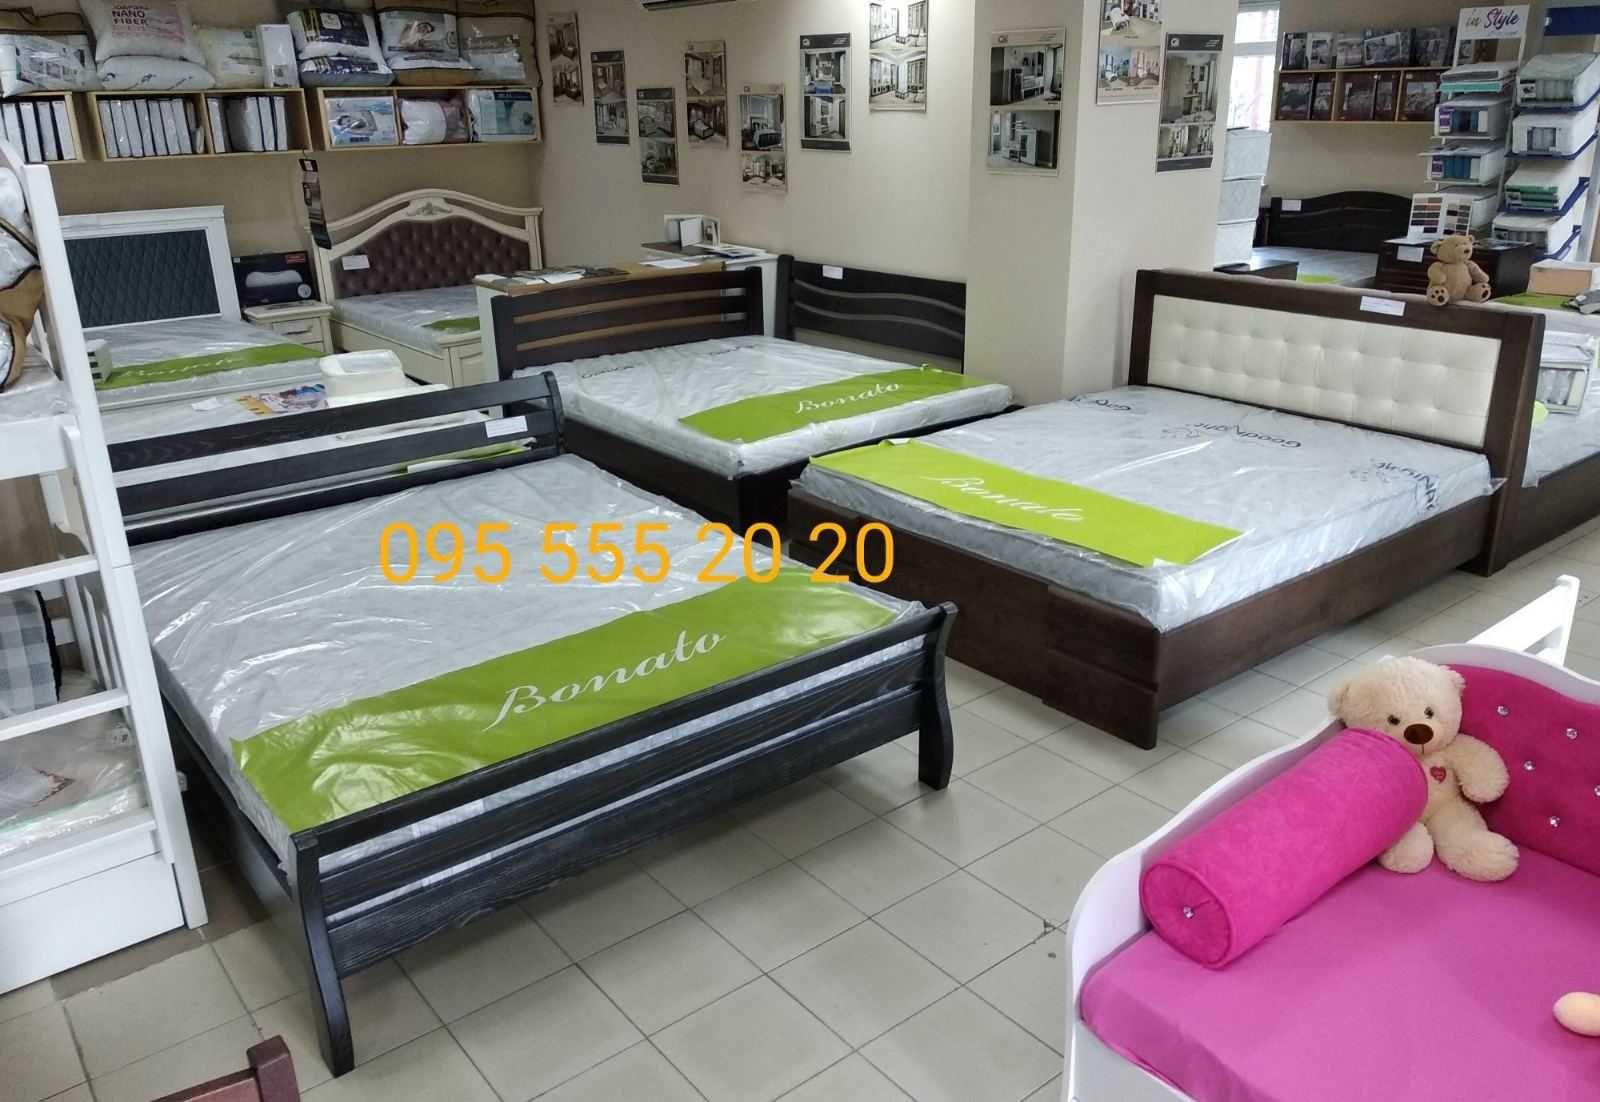 Оригінальні двоспальні ліжка з ясеня 160х200, готові, Луцьк, магазин